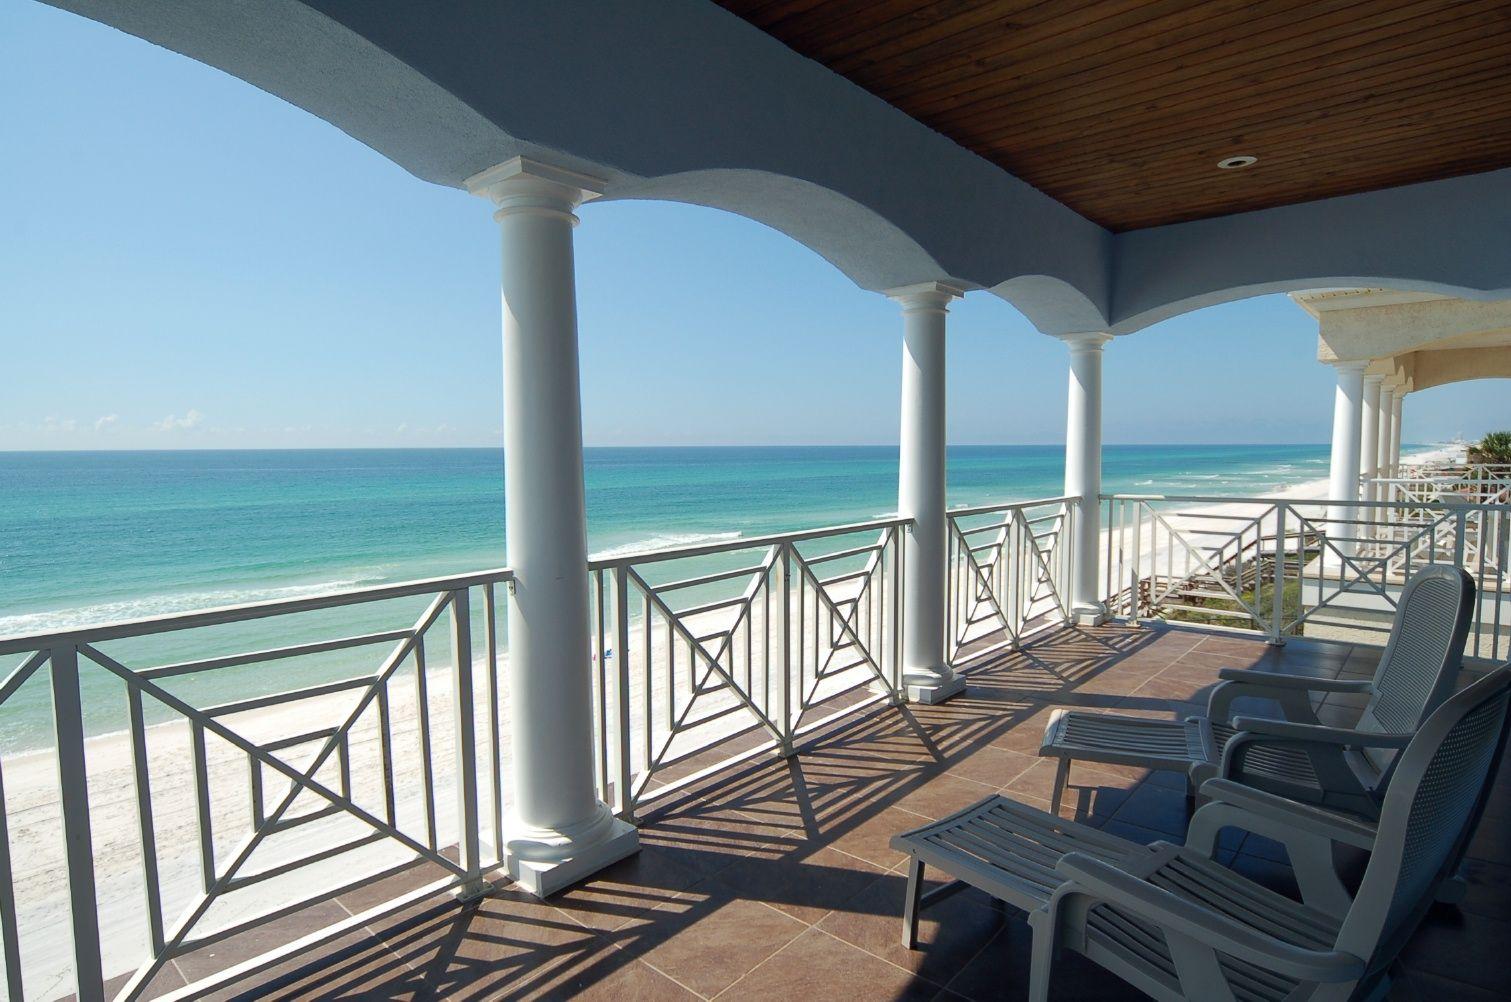 Florida Vacation Homes  Oceanfront vacation rentals